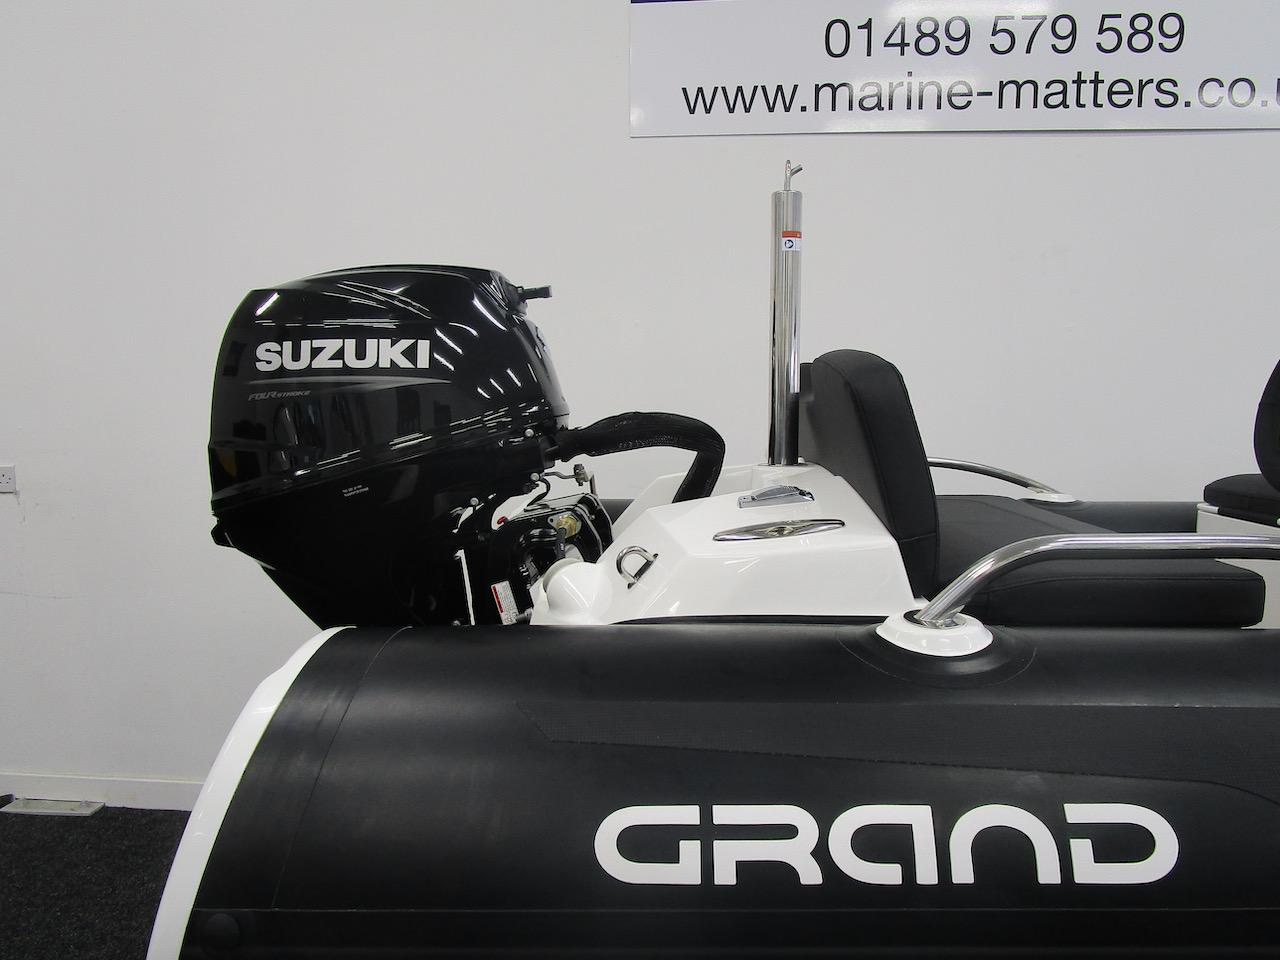 GRAND Tube and Suzuki DF30ATL engine